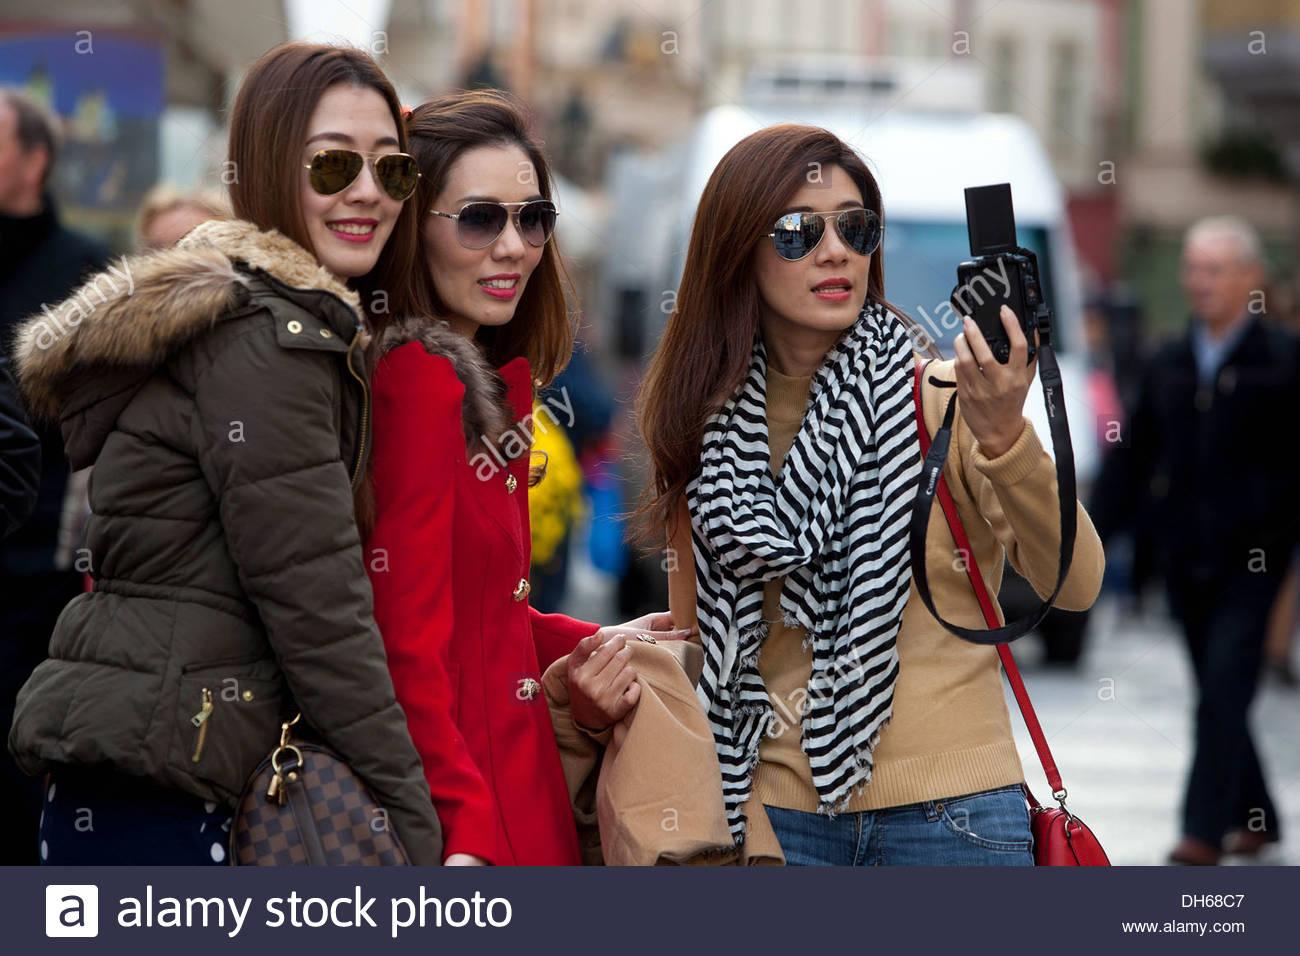 woman-fuckhard-asian-woman-photographing-street